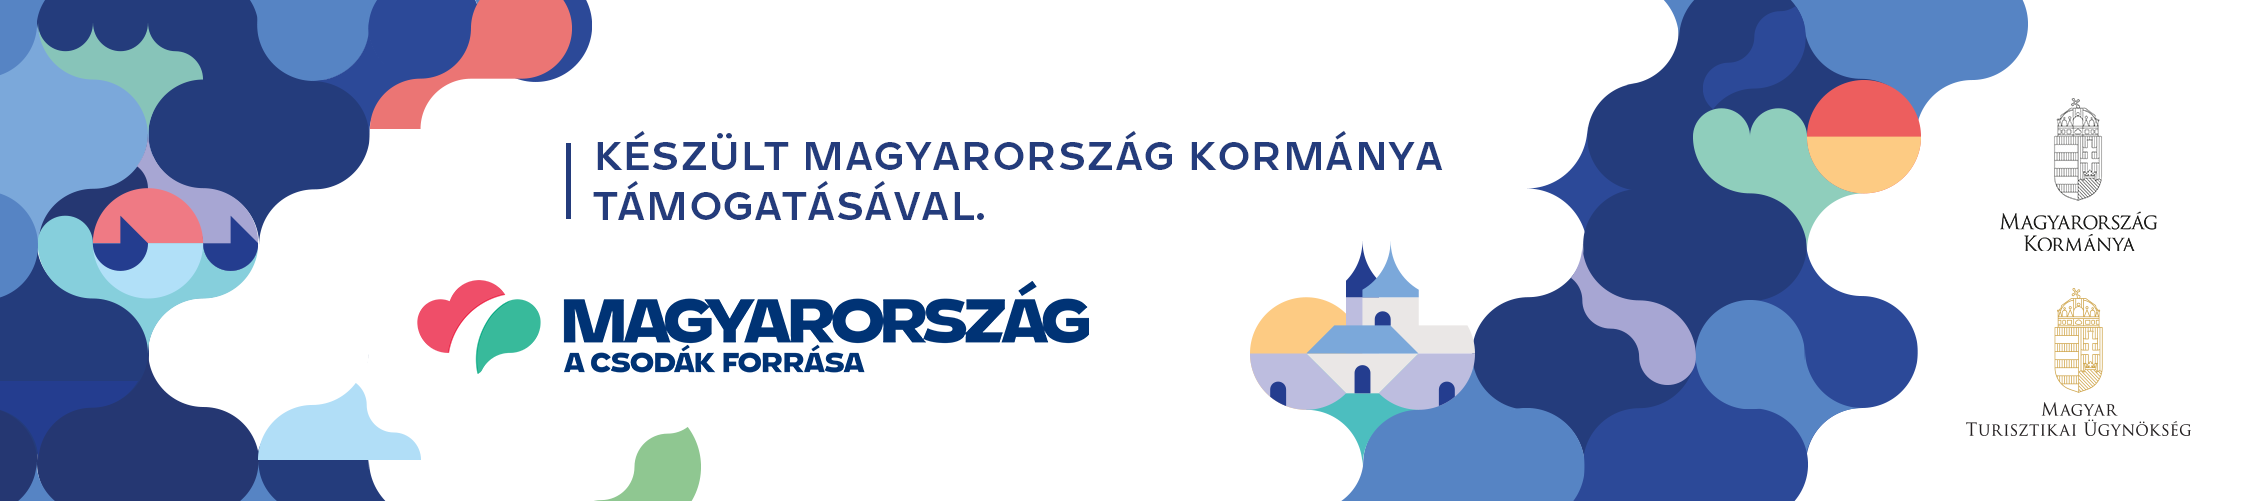 palyazat-banner